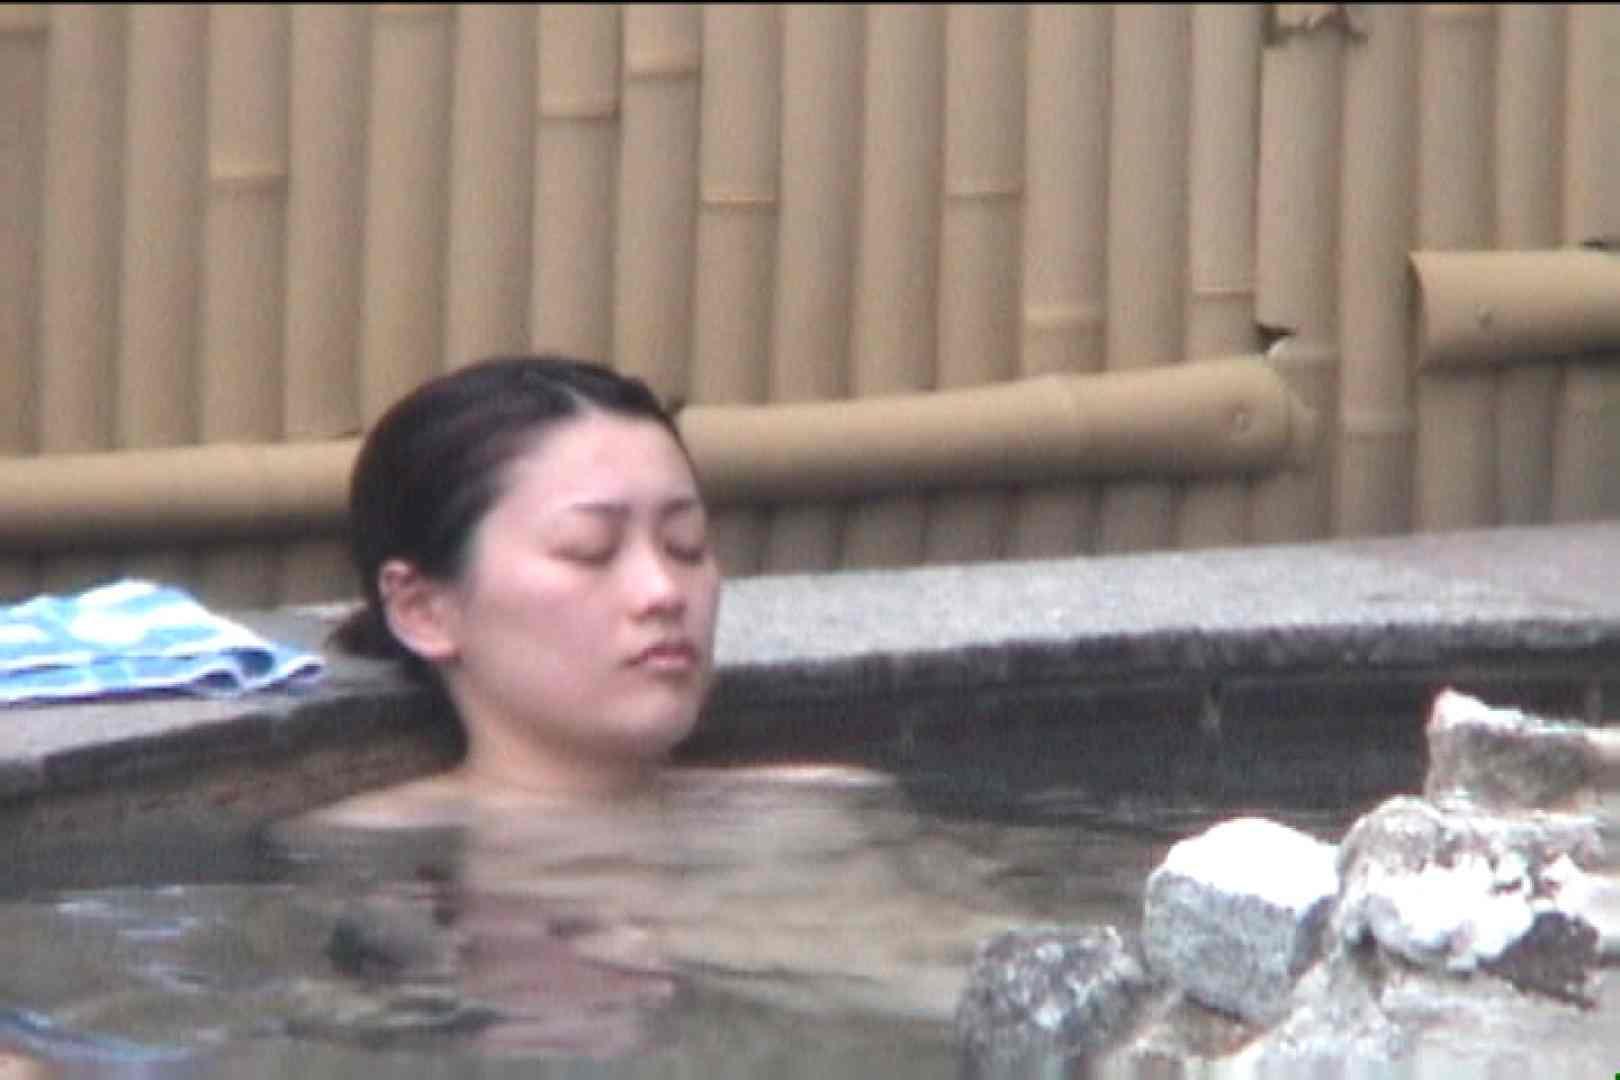 Aquaな露天風呂Vol.92【VIP限定】 露天 | 盗撮特撮  11pic 7